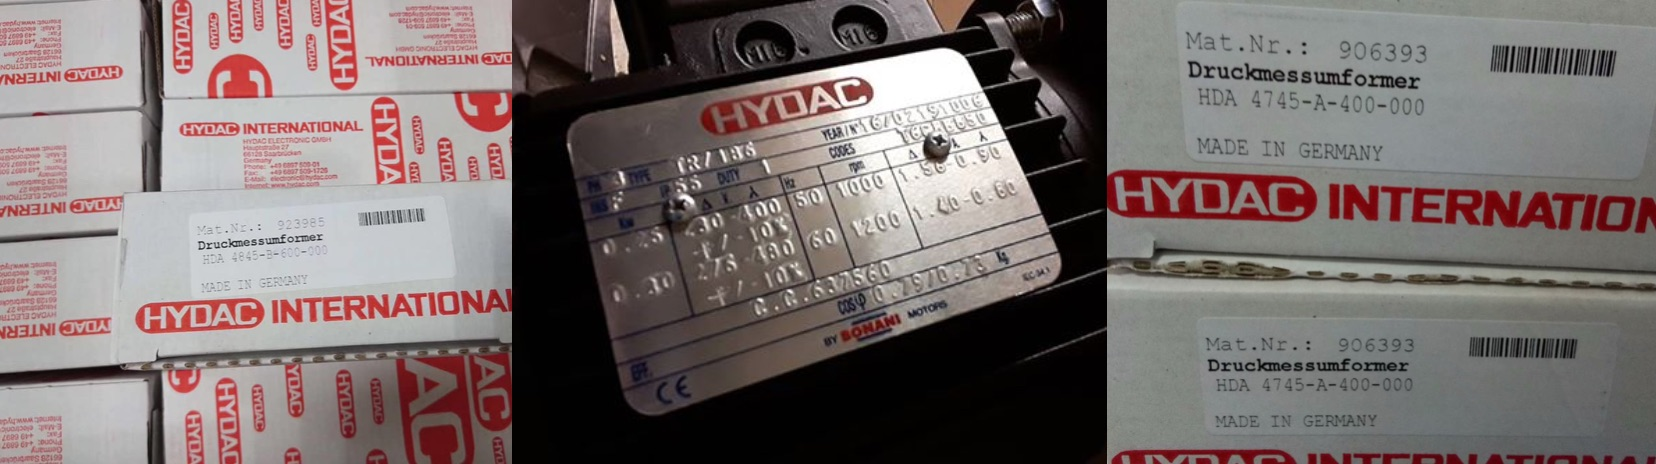 Hydac89.jpg